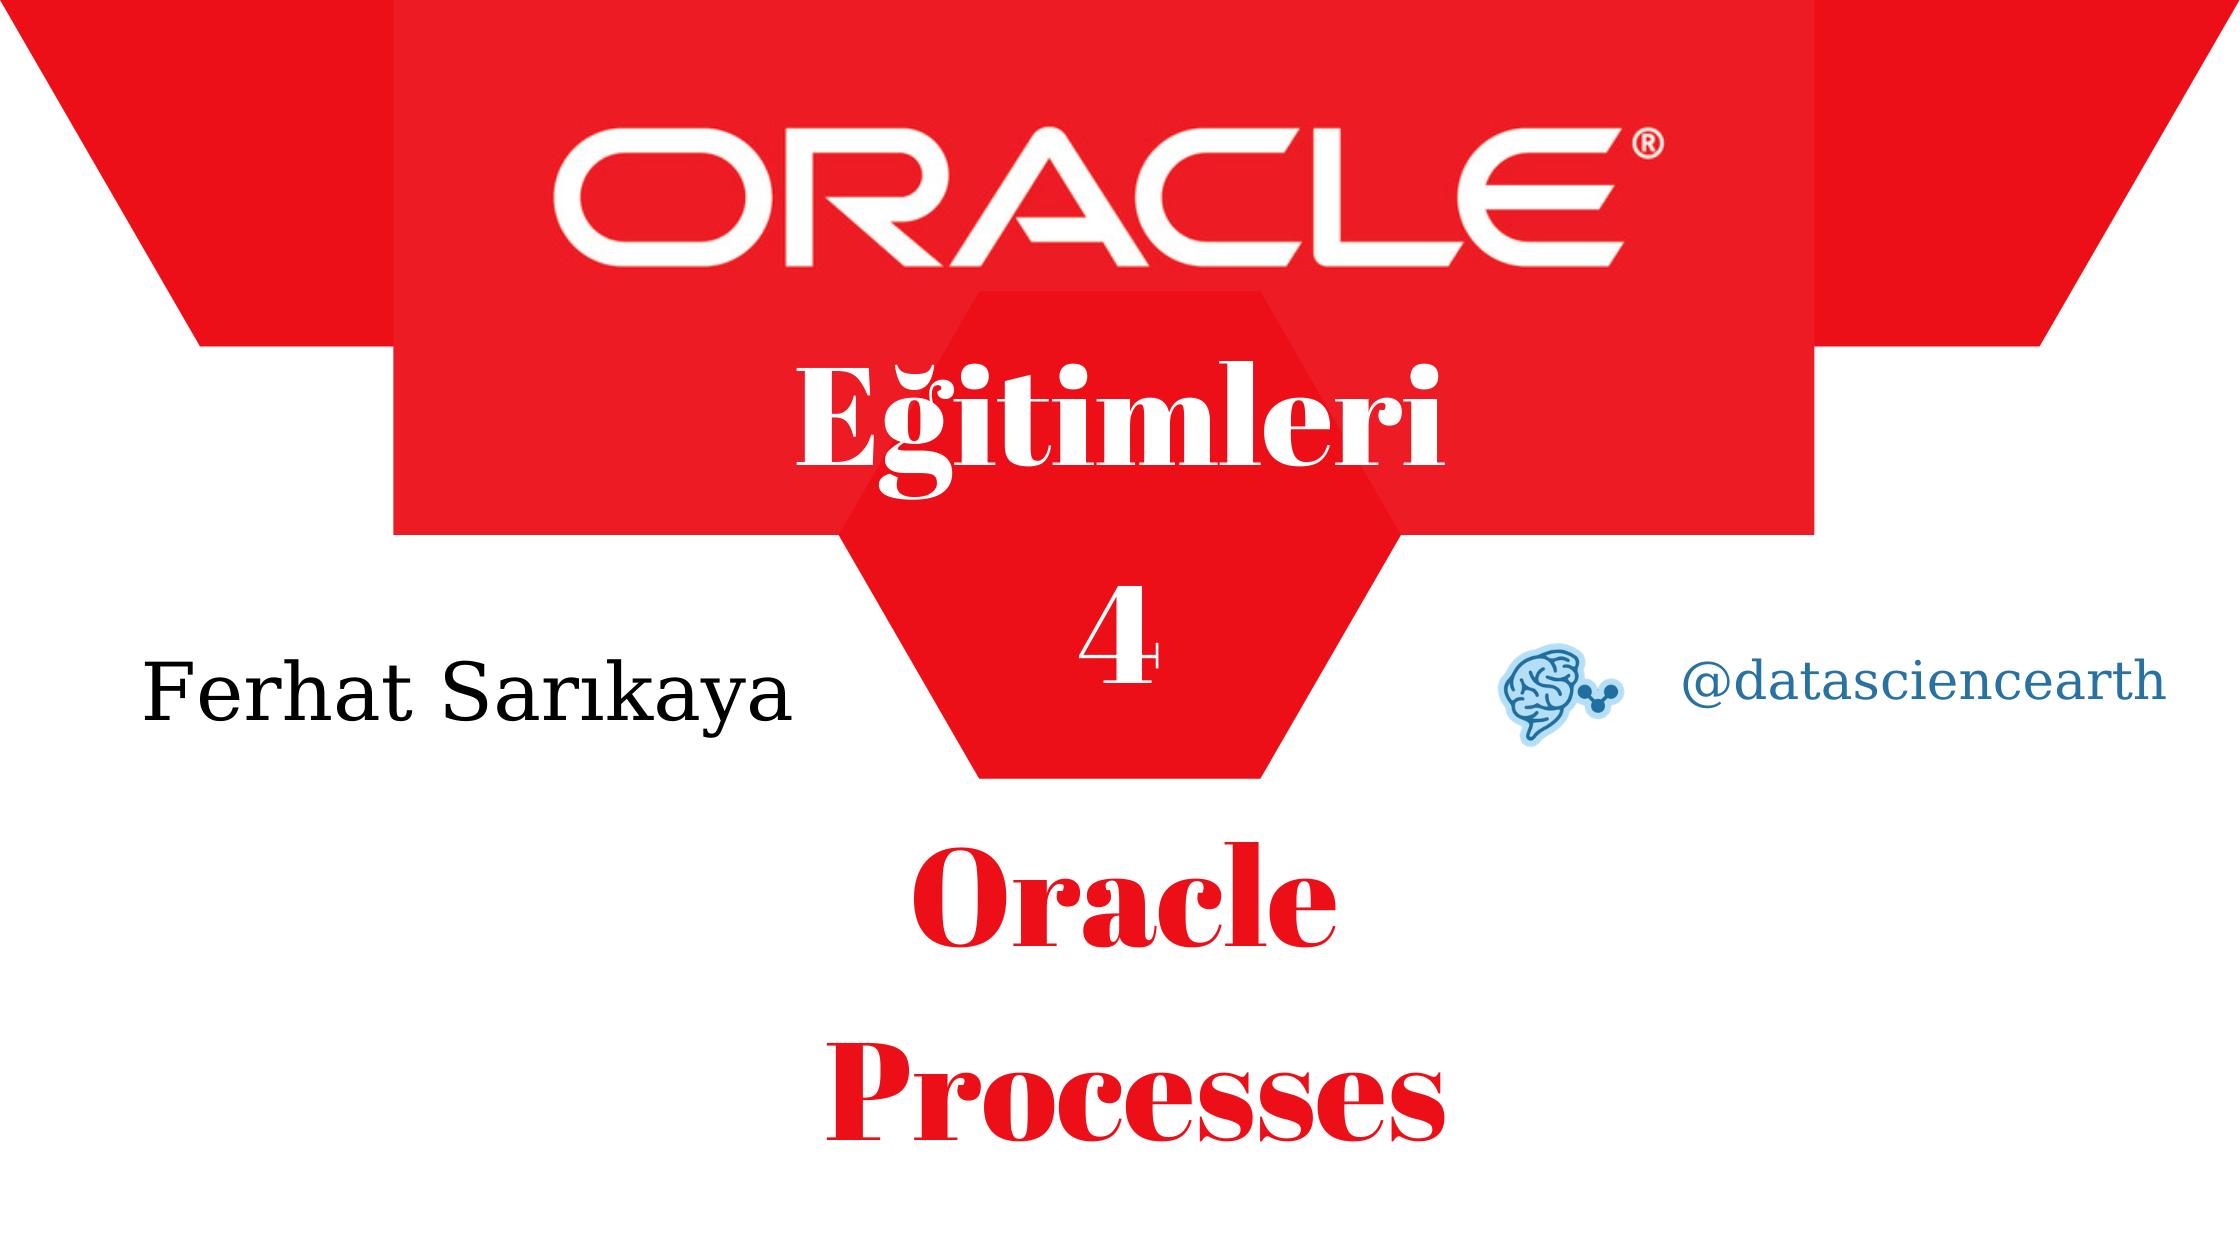 Oracle Eğitimleri - Oracle Processes